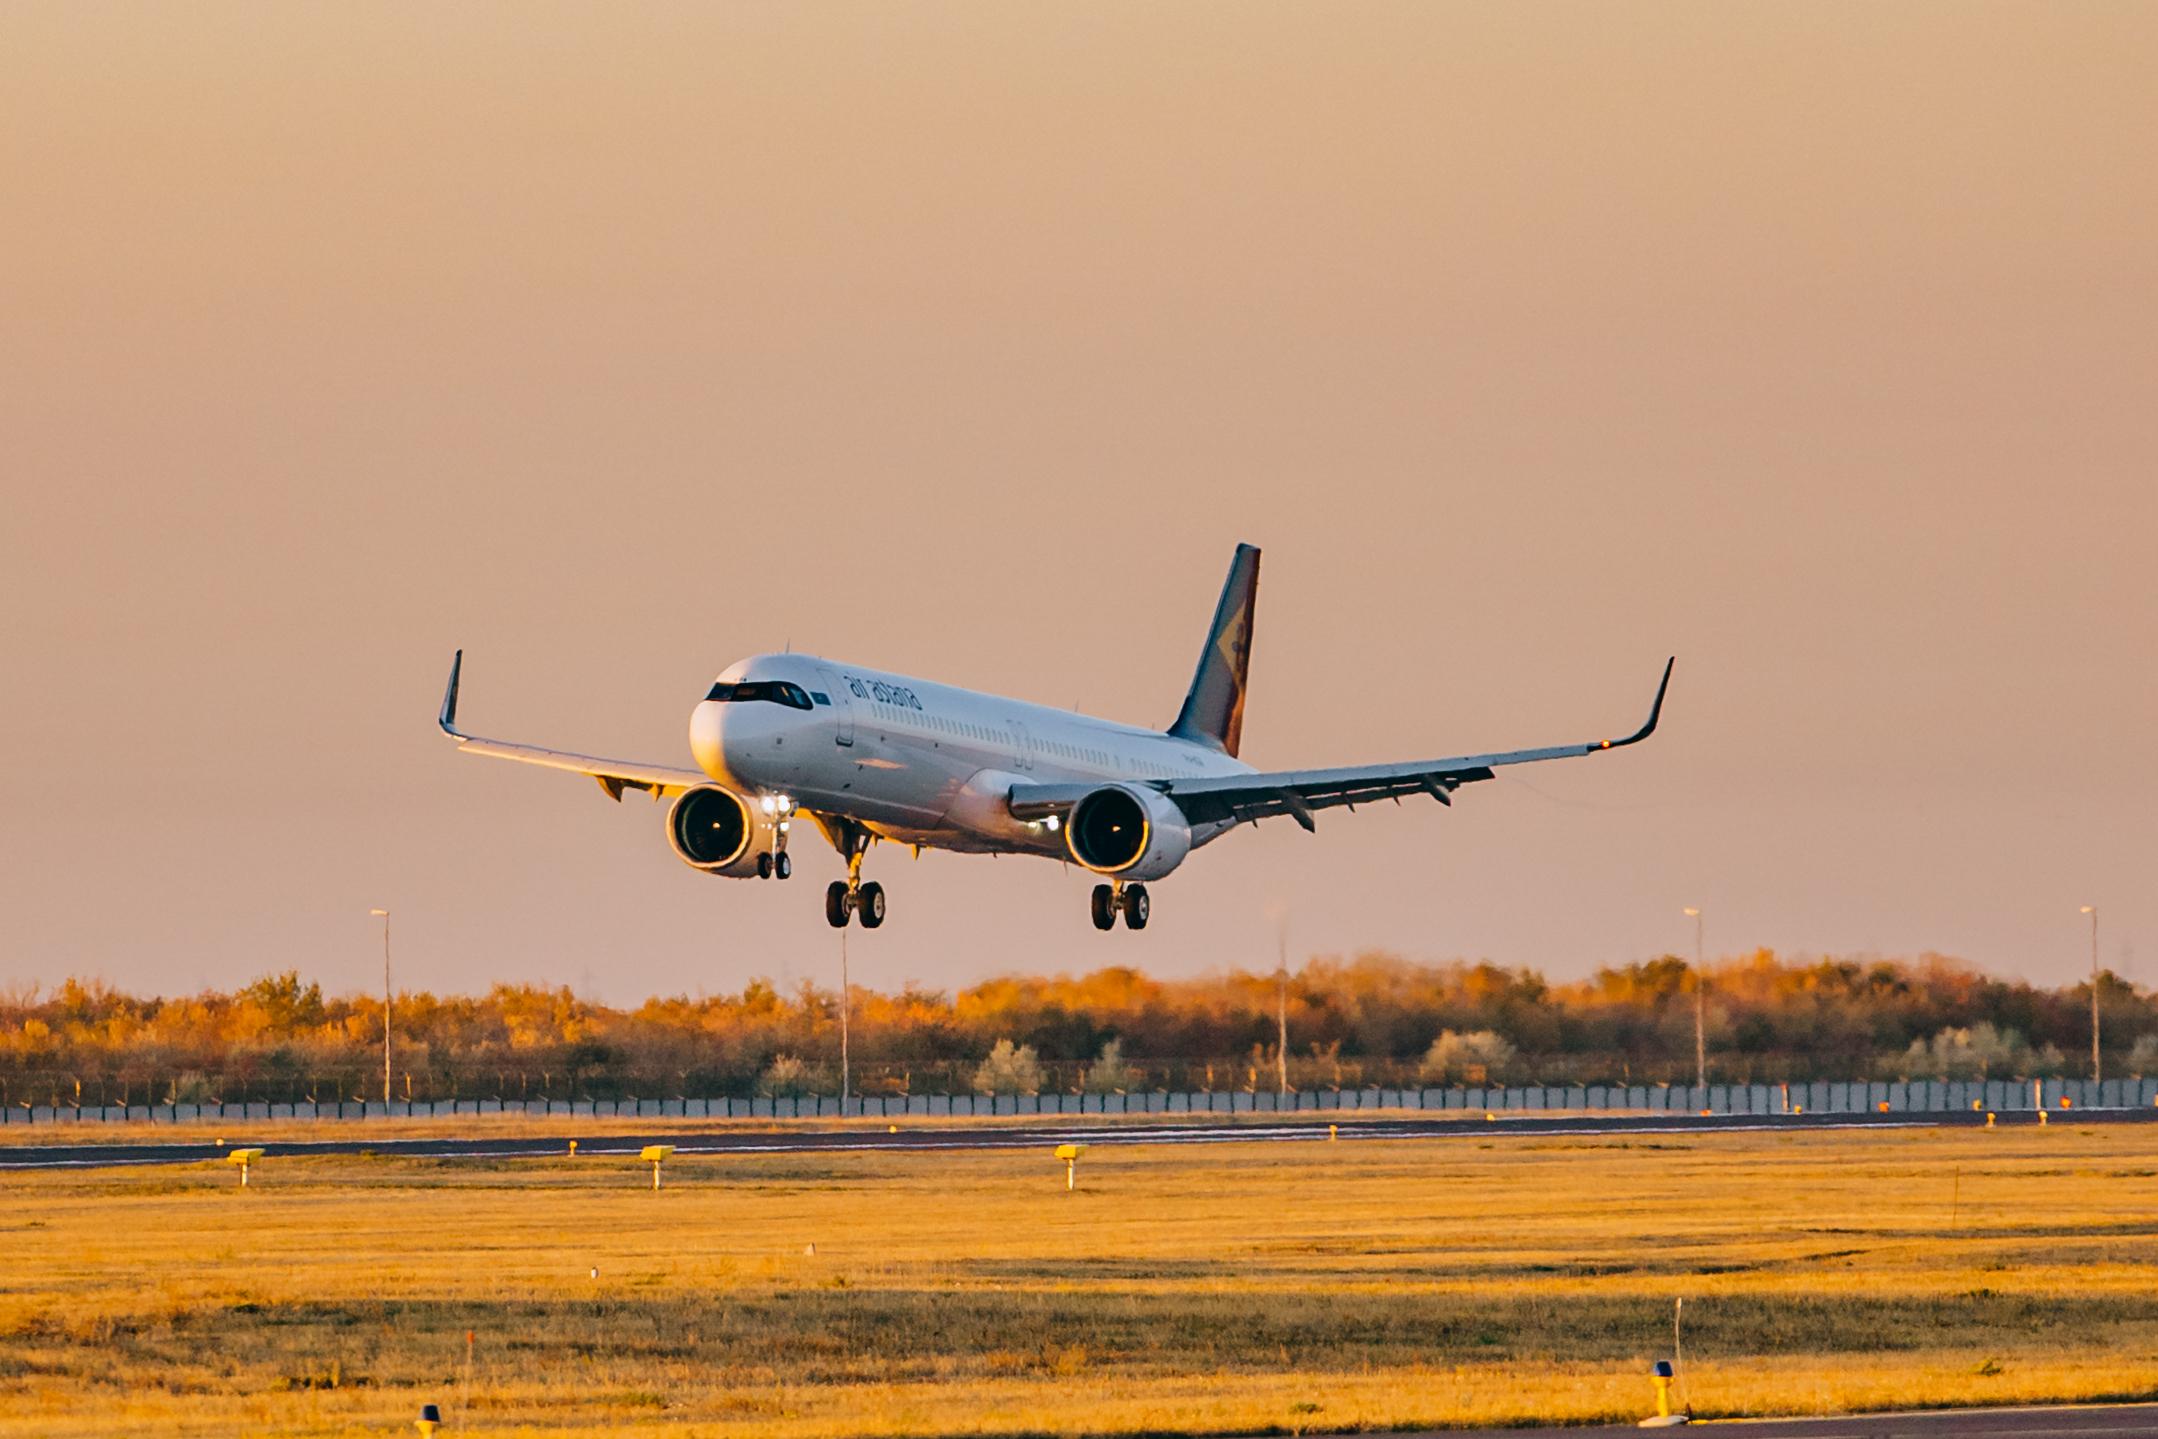 Almaty to Frankfurt soon on Air Astana